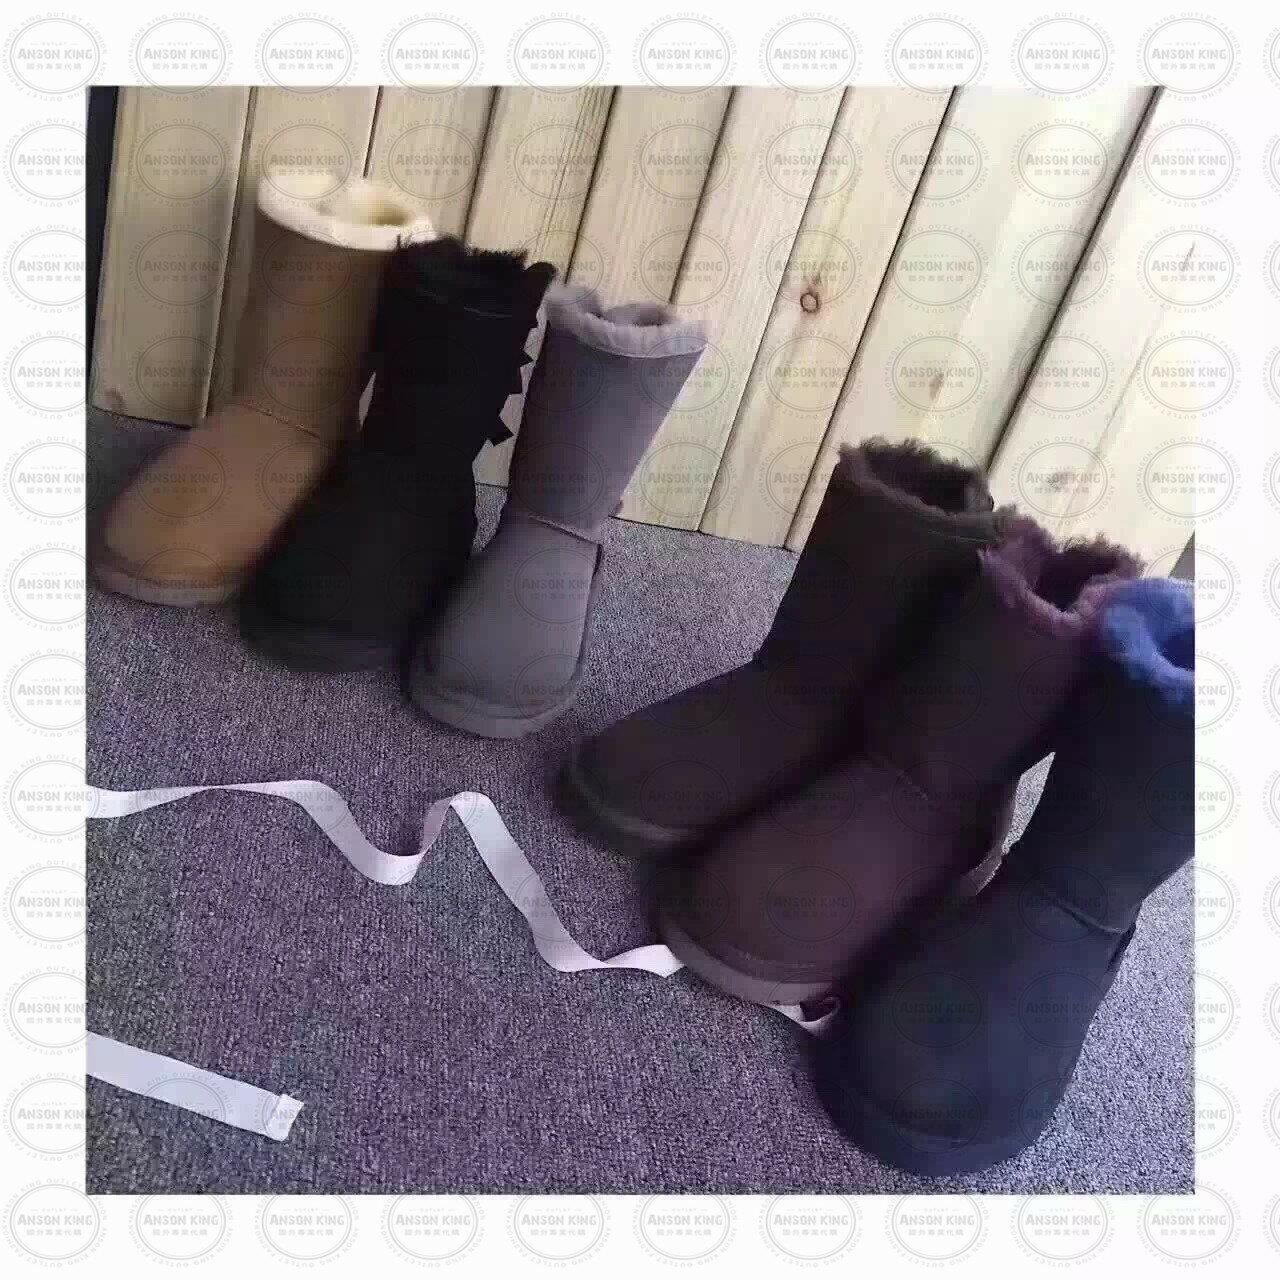 OUTLET正品代購 澳洲 UGG 蝴蝶結3280羊皮毛一體 中長靴 保暖 真皮羊皮毛 雪靴 短靴 深褐色 1